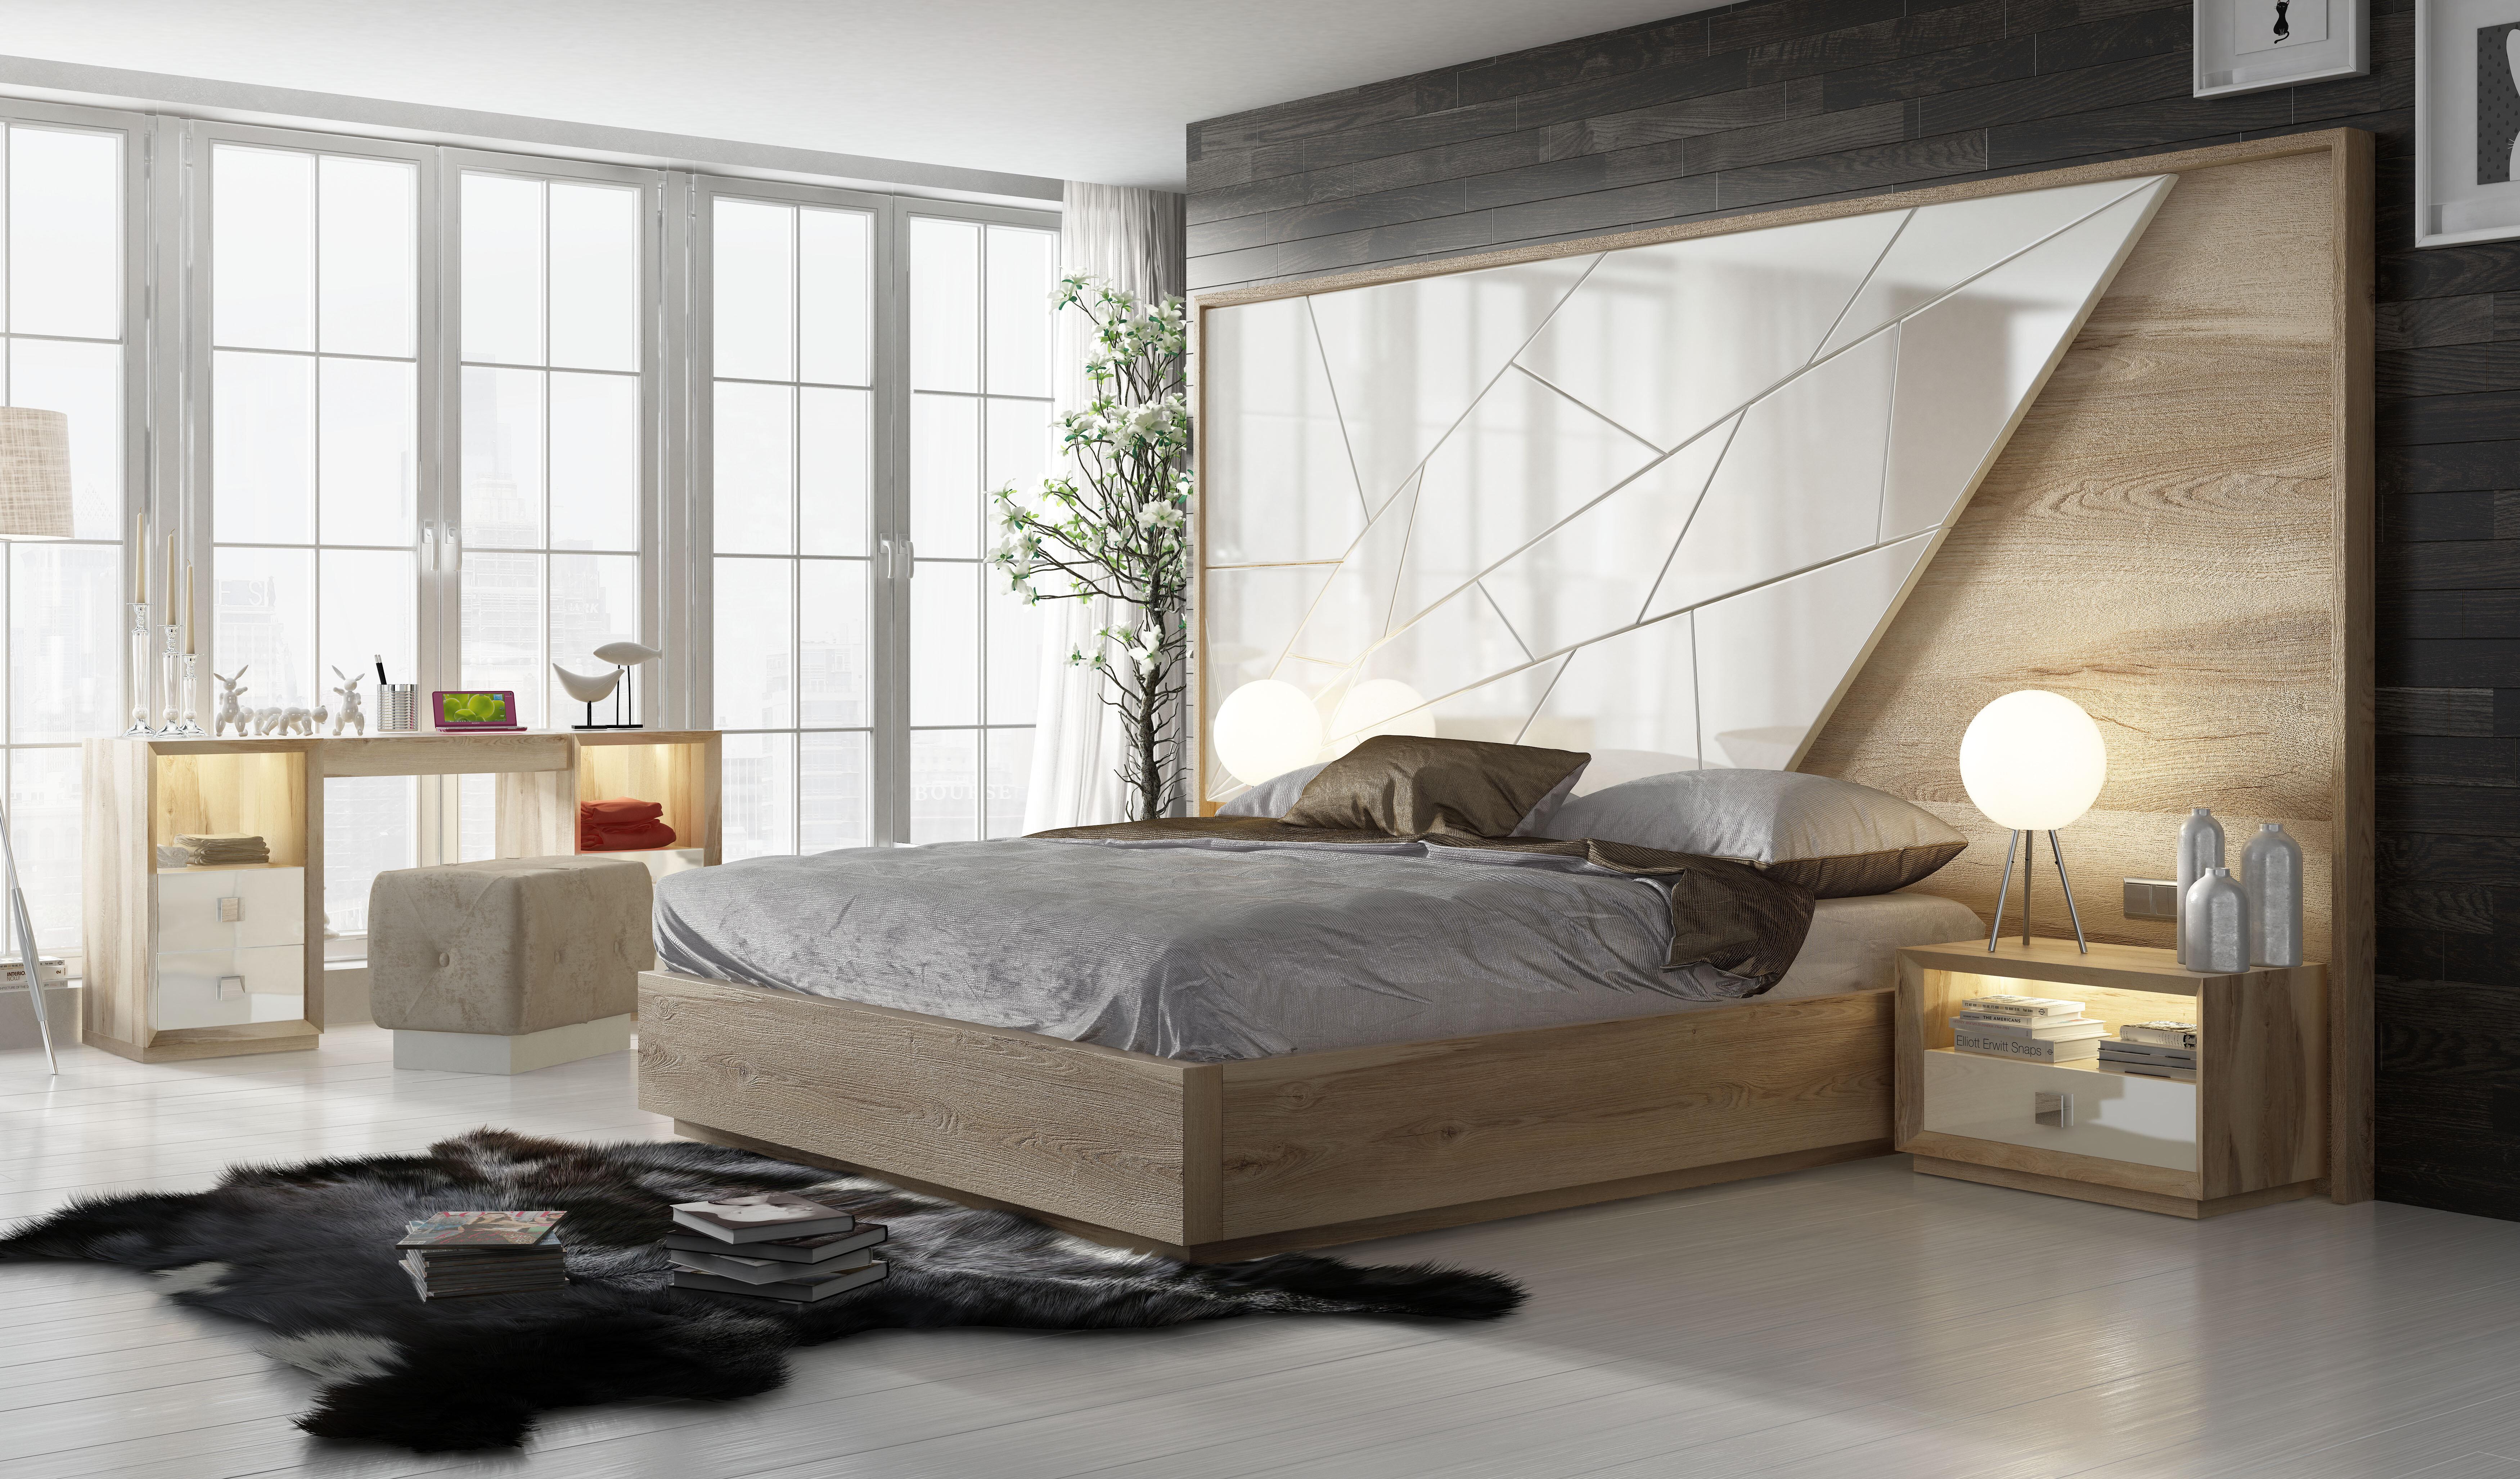 Hispania Home London Bedor47 Bedroom Wayfair